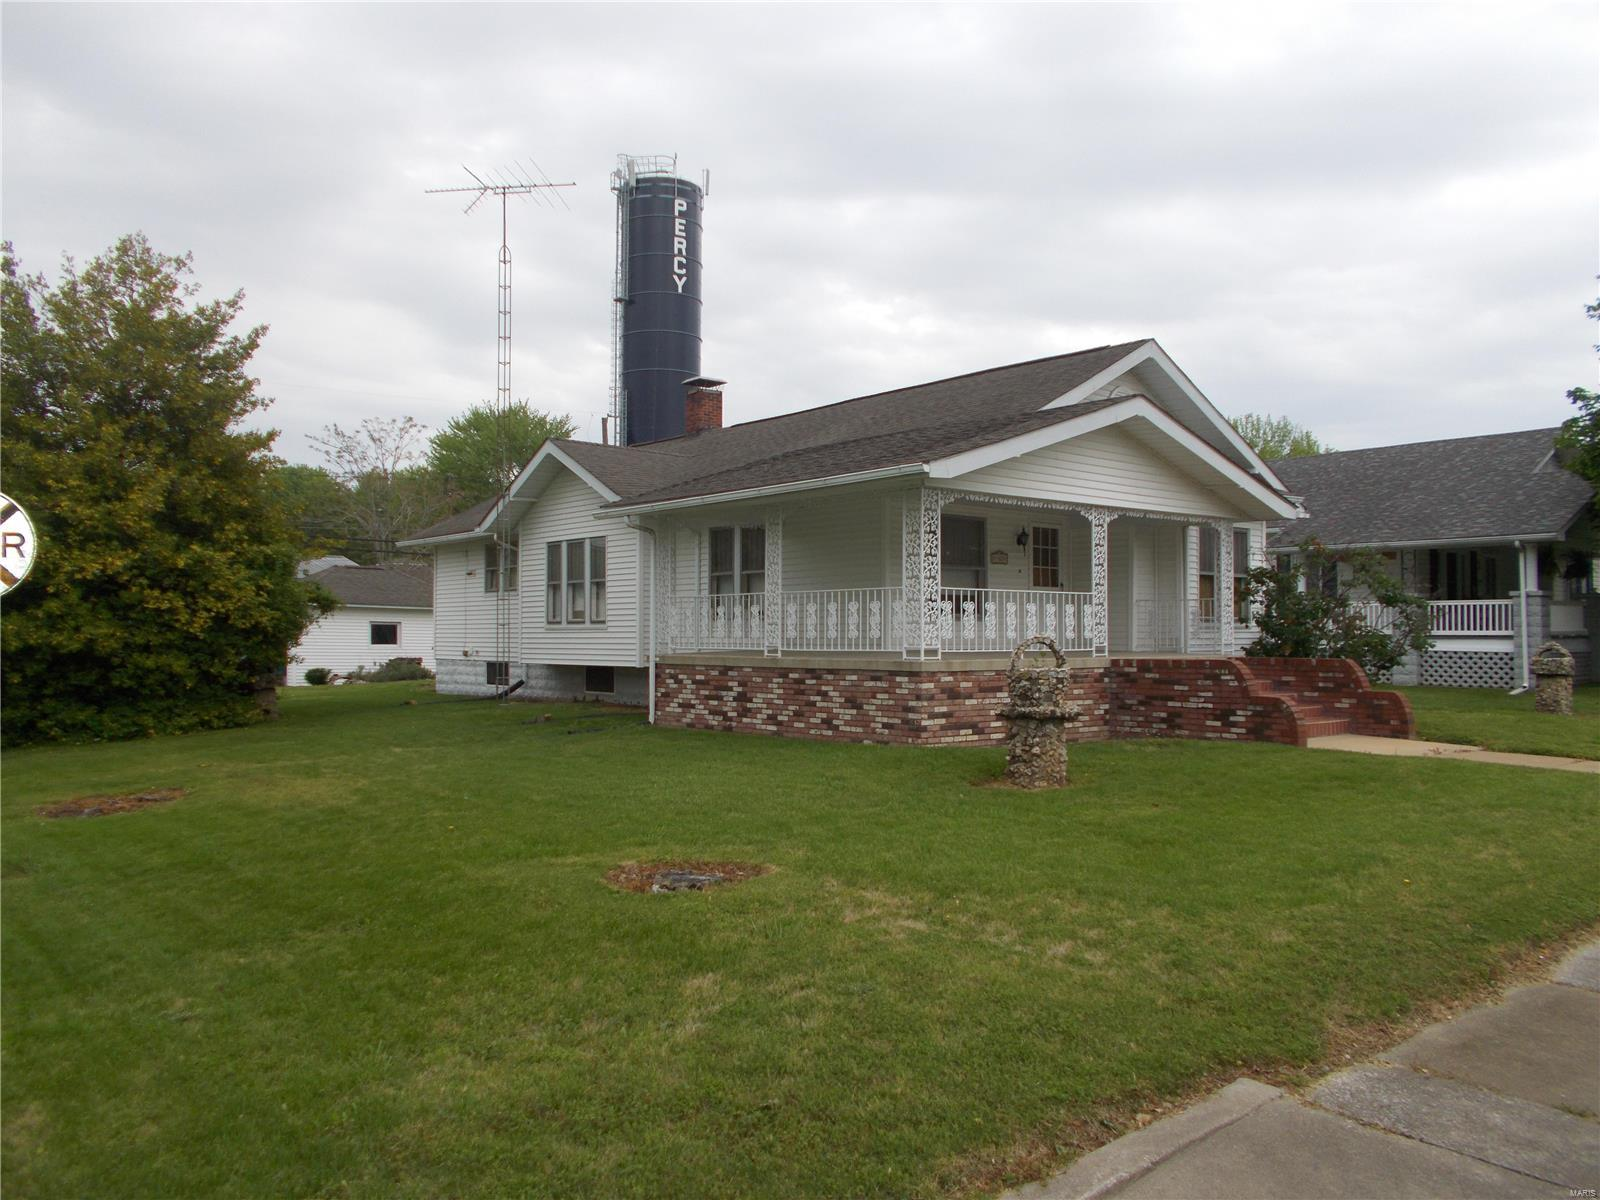 402 E Pine Property Photo - Percy, IL real estate listing